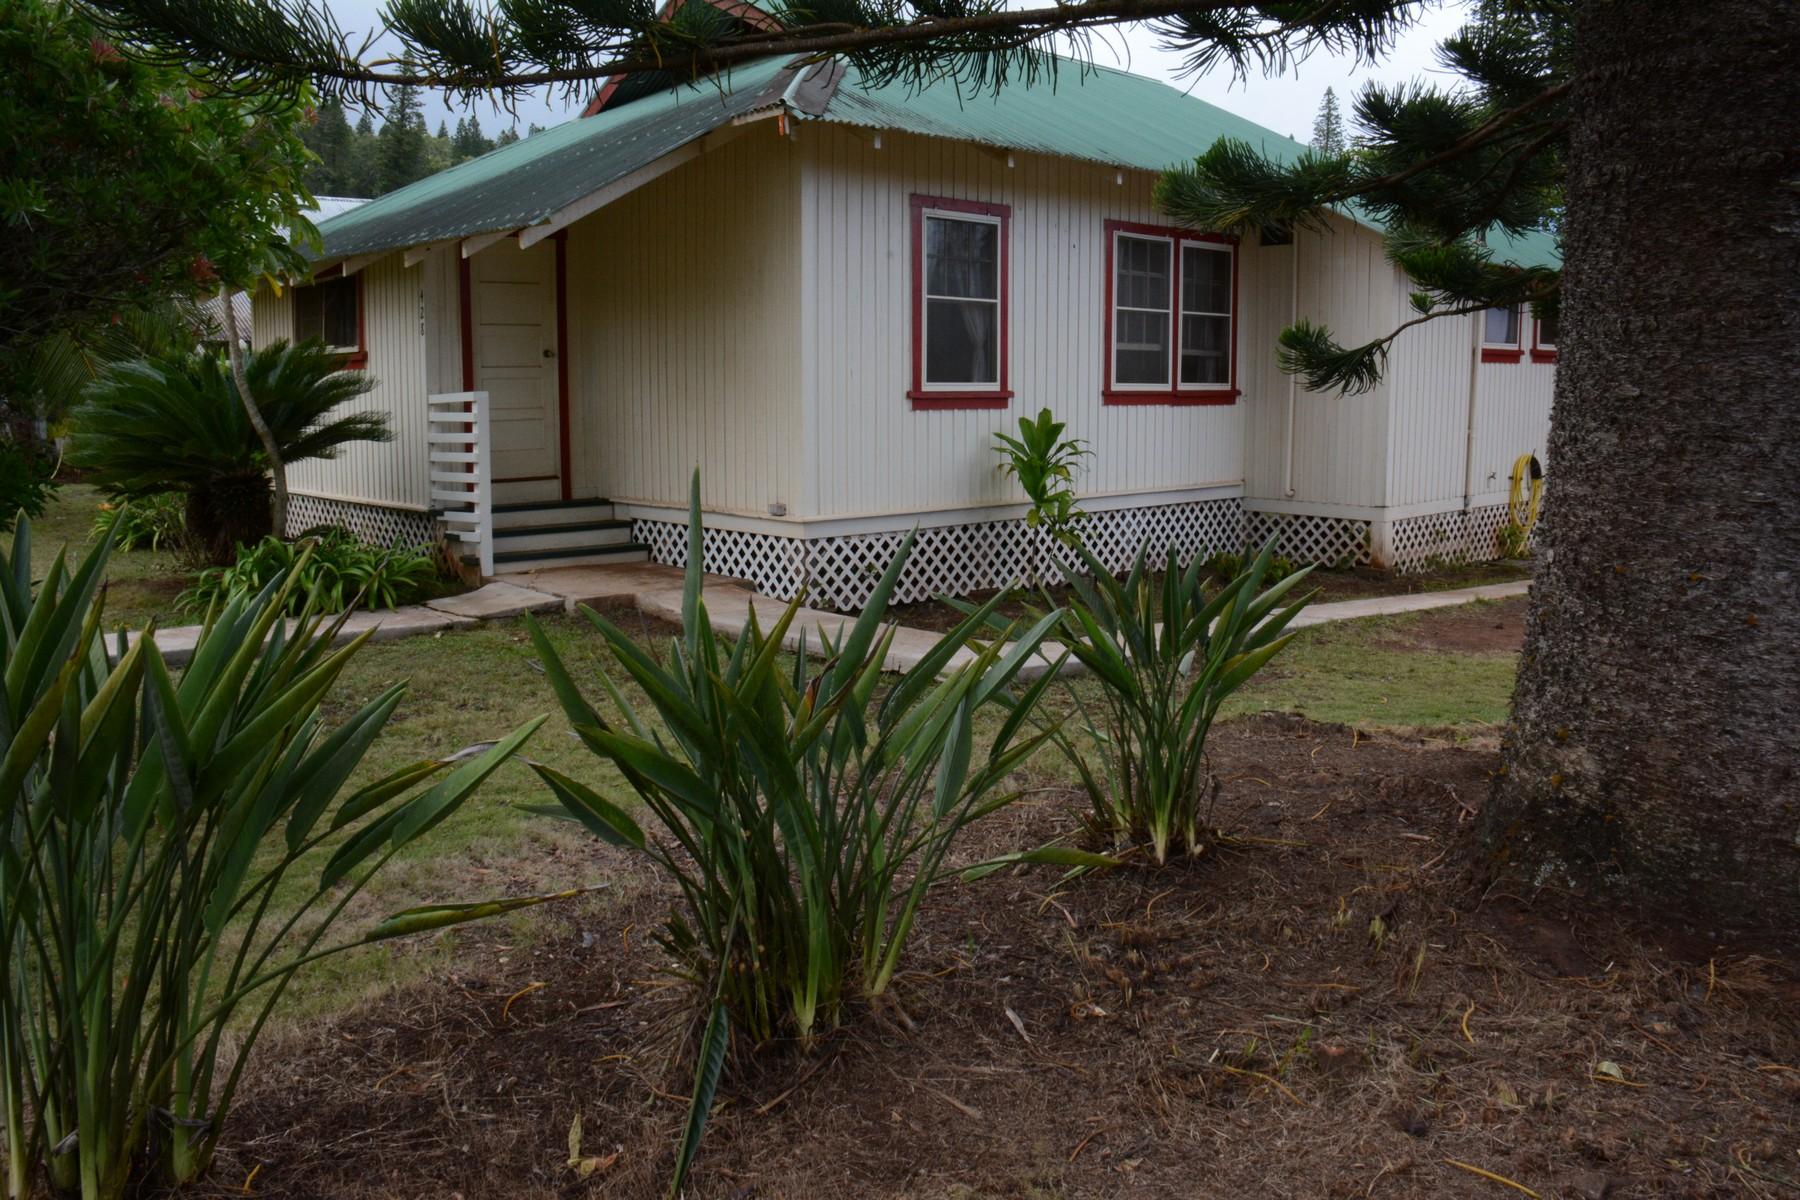 Single Family Homes for Sale at Lanai Plantation Home Get-A-Way 428 Fifth Street Lanai City, Hawaii 96763 United States